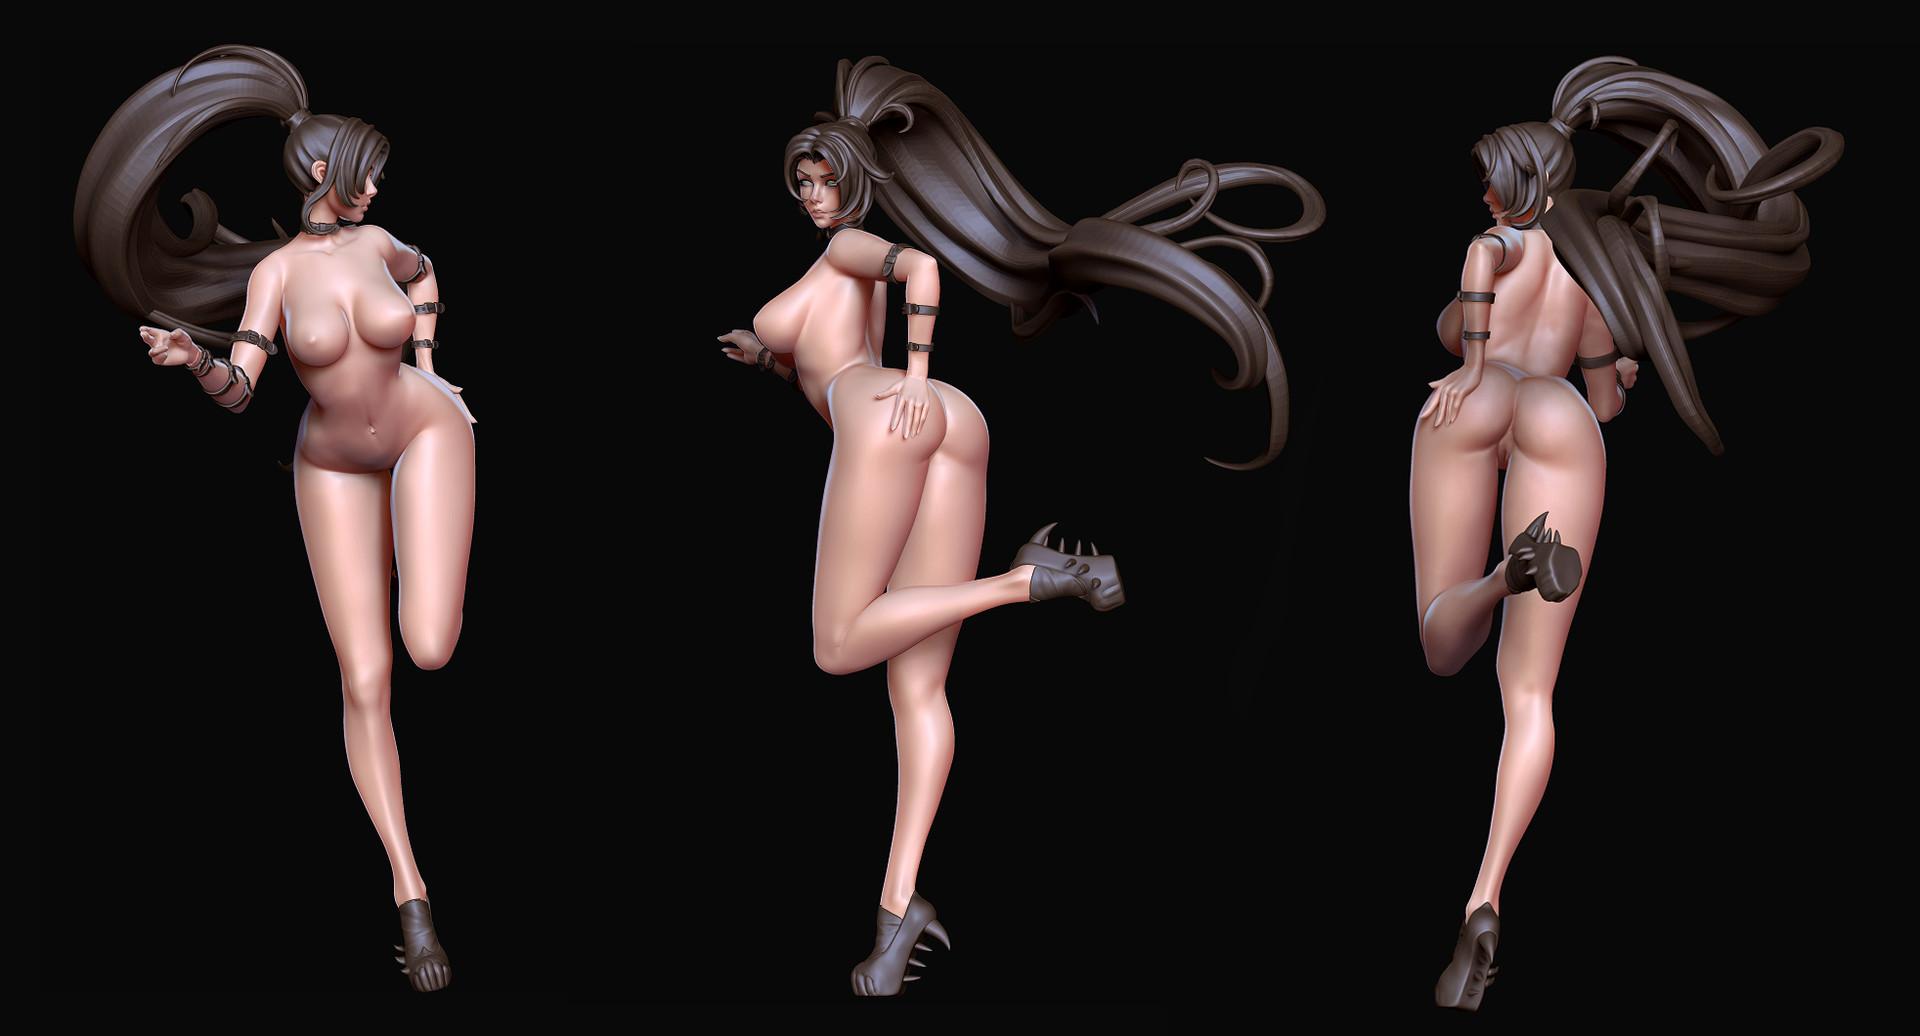 Layna lazar hammergirl wip 08 nude1